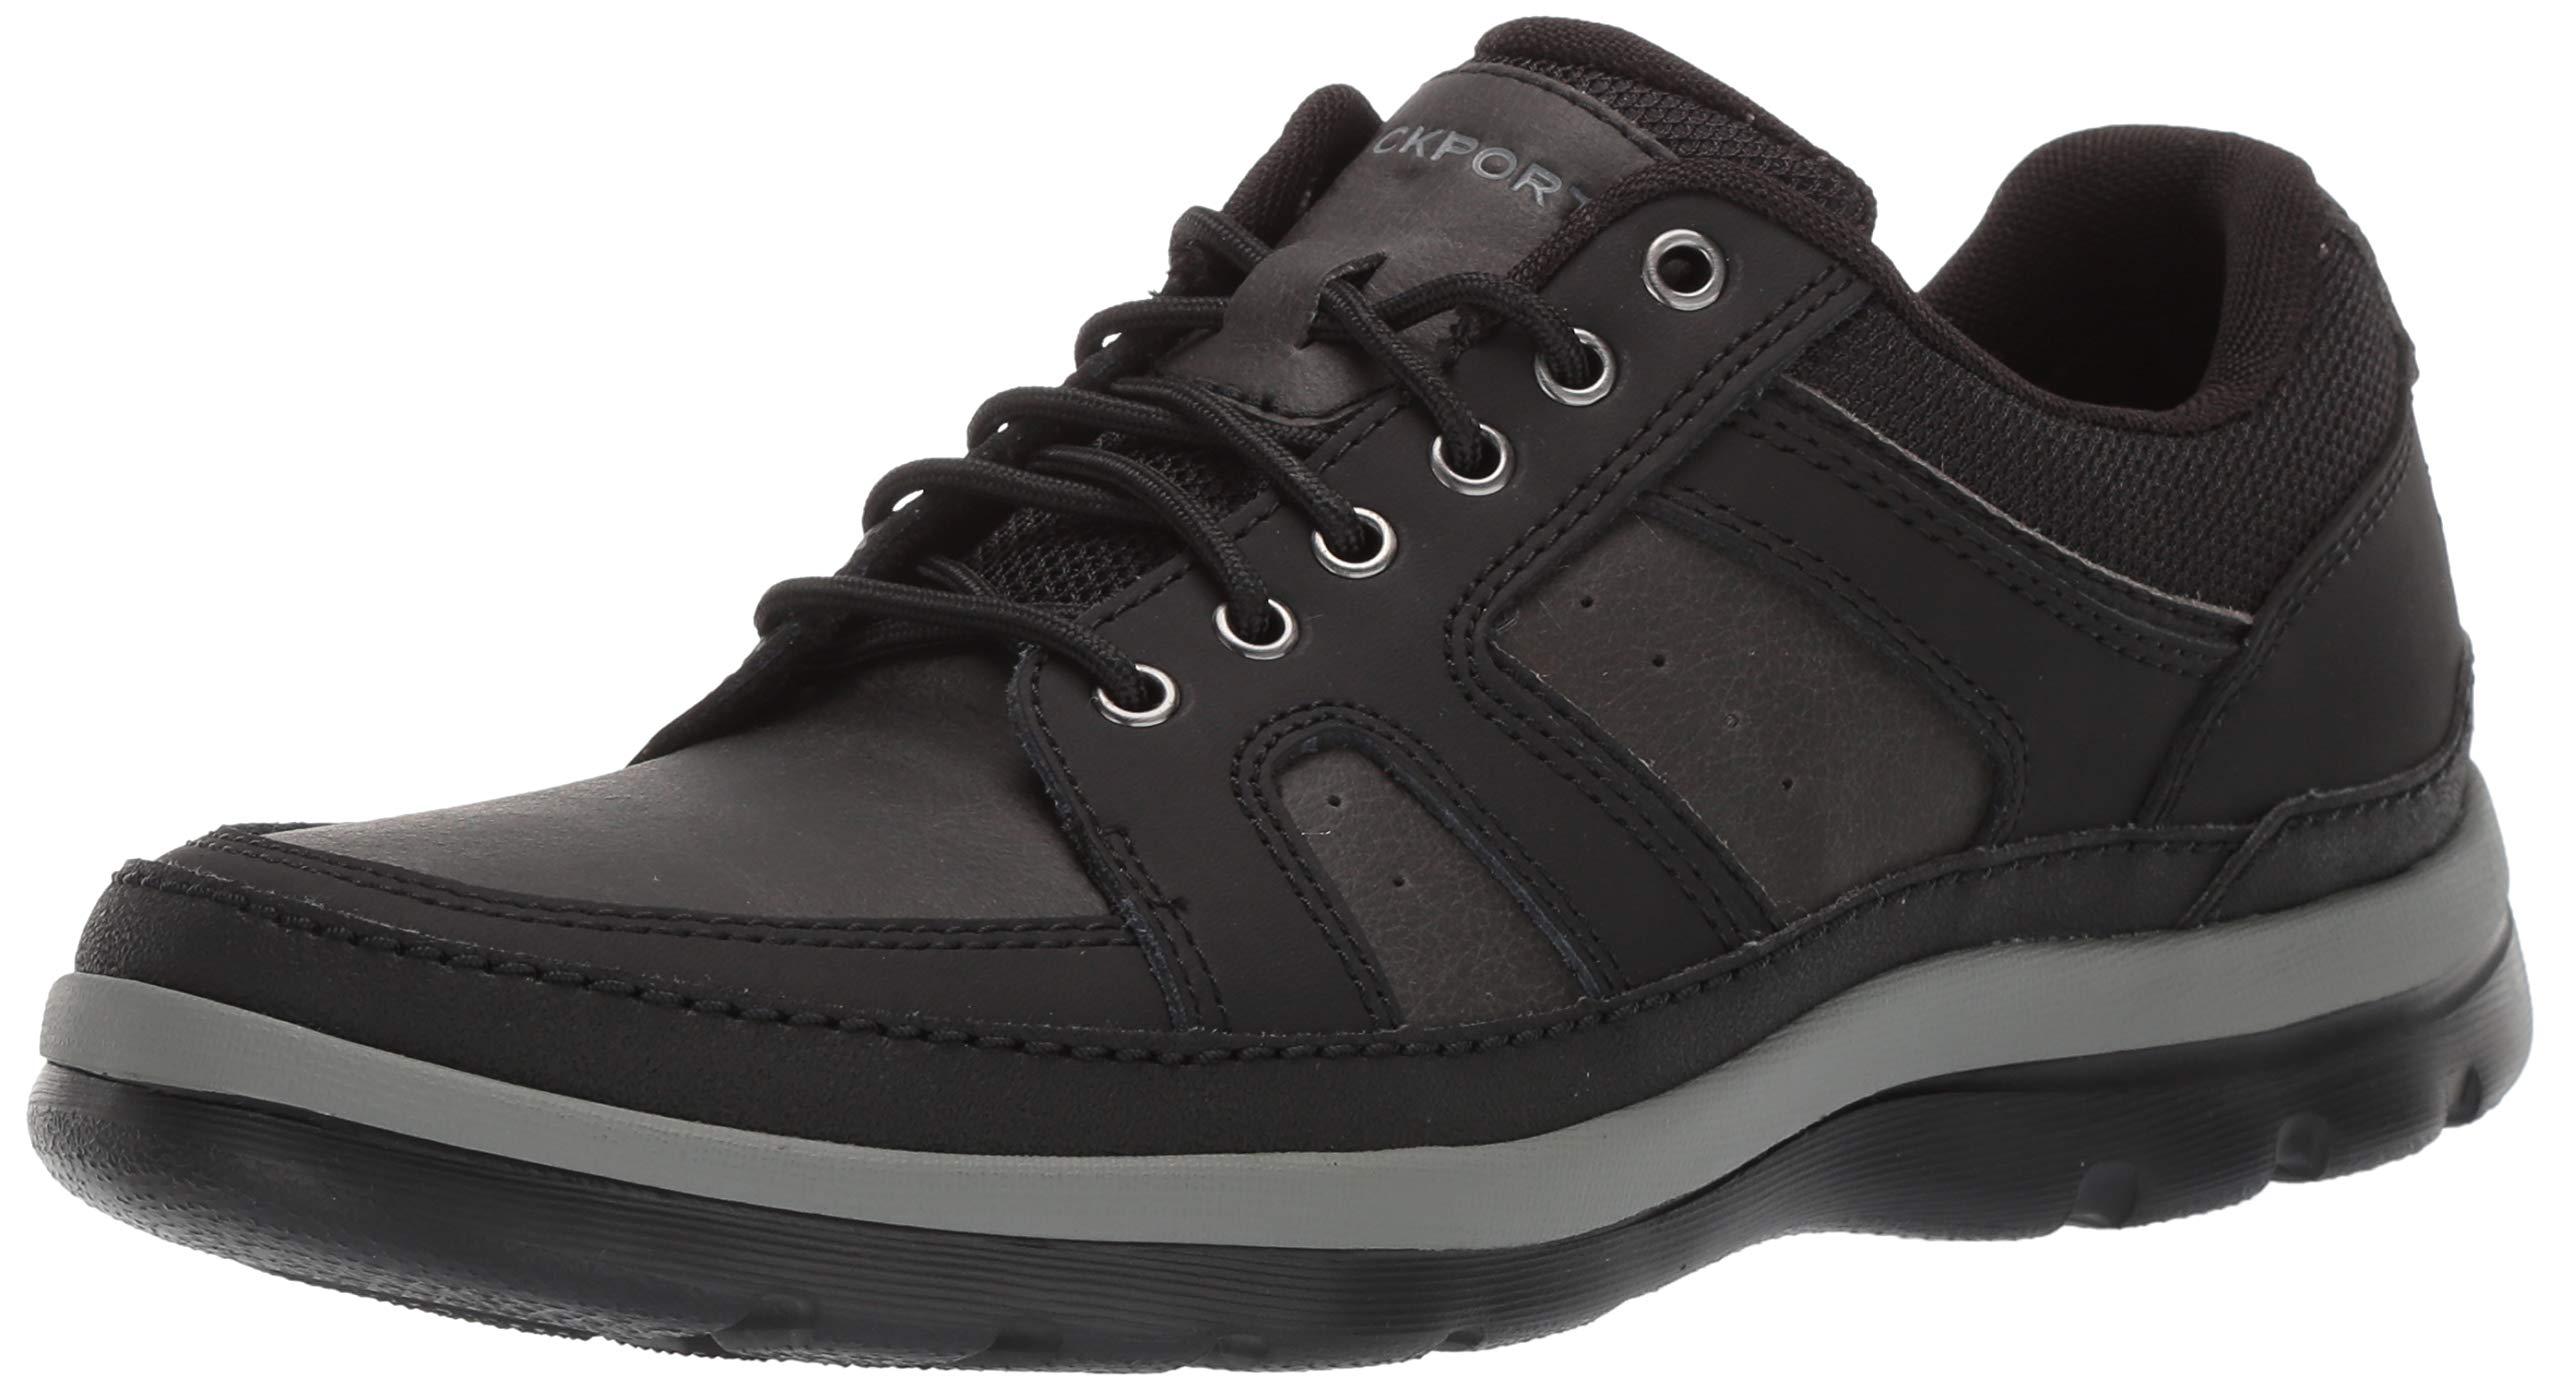 Rockport Men's Get Your Kicks Mudguard Blucher Oxford, Black 2, 8 W US